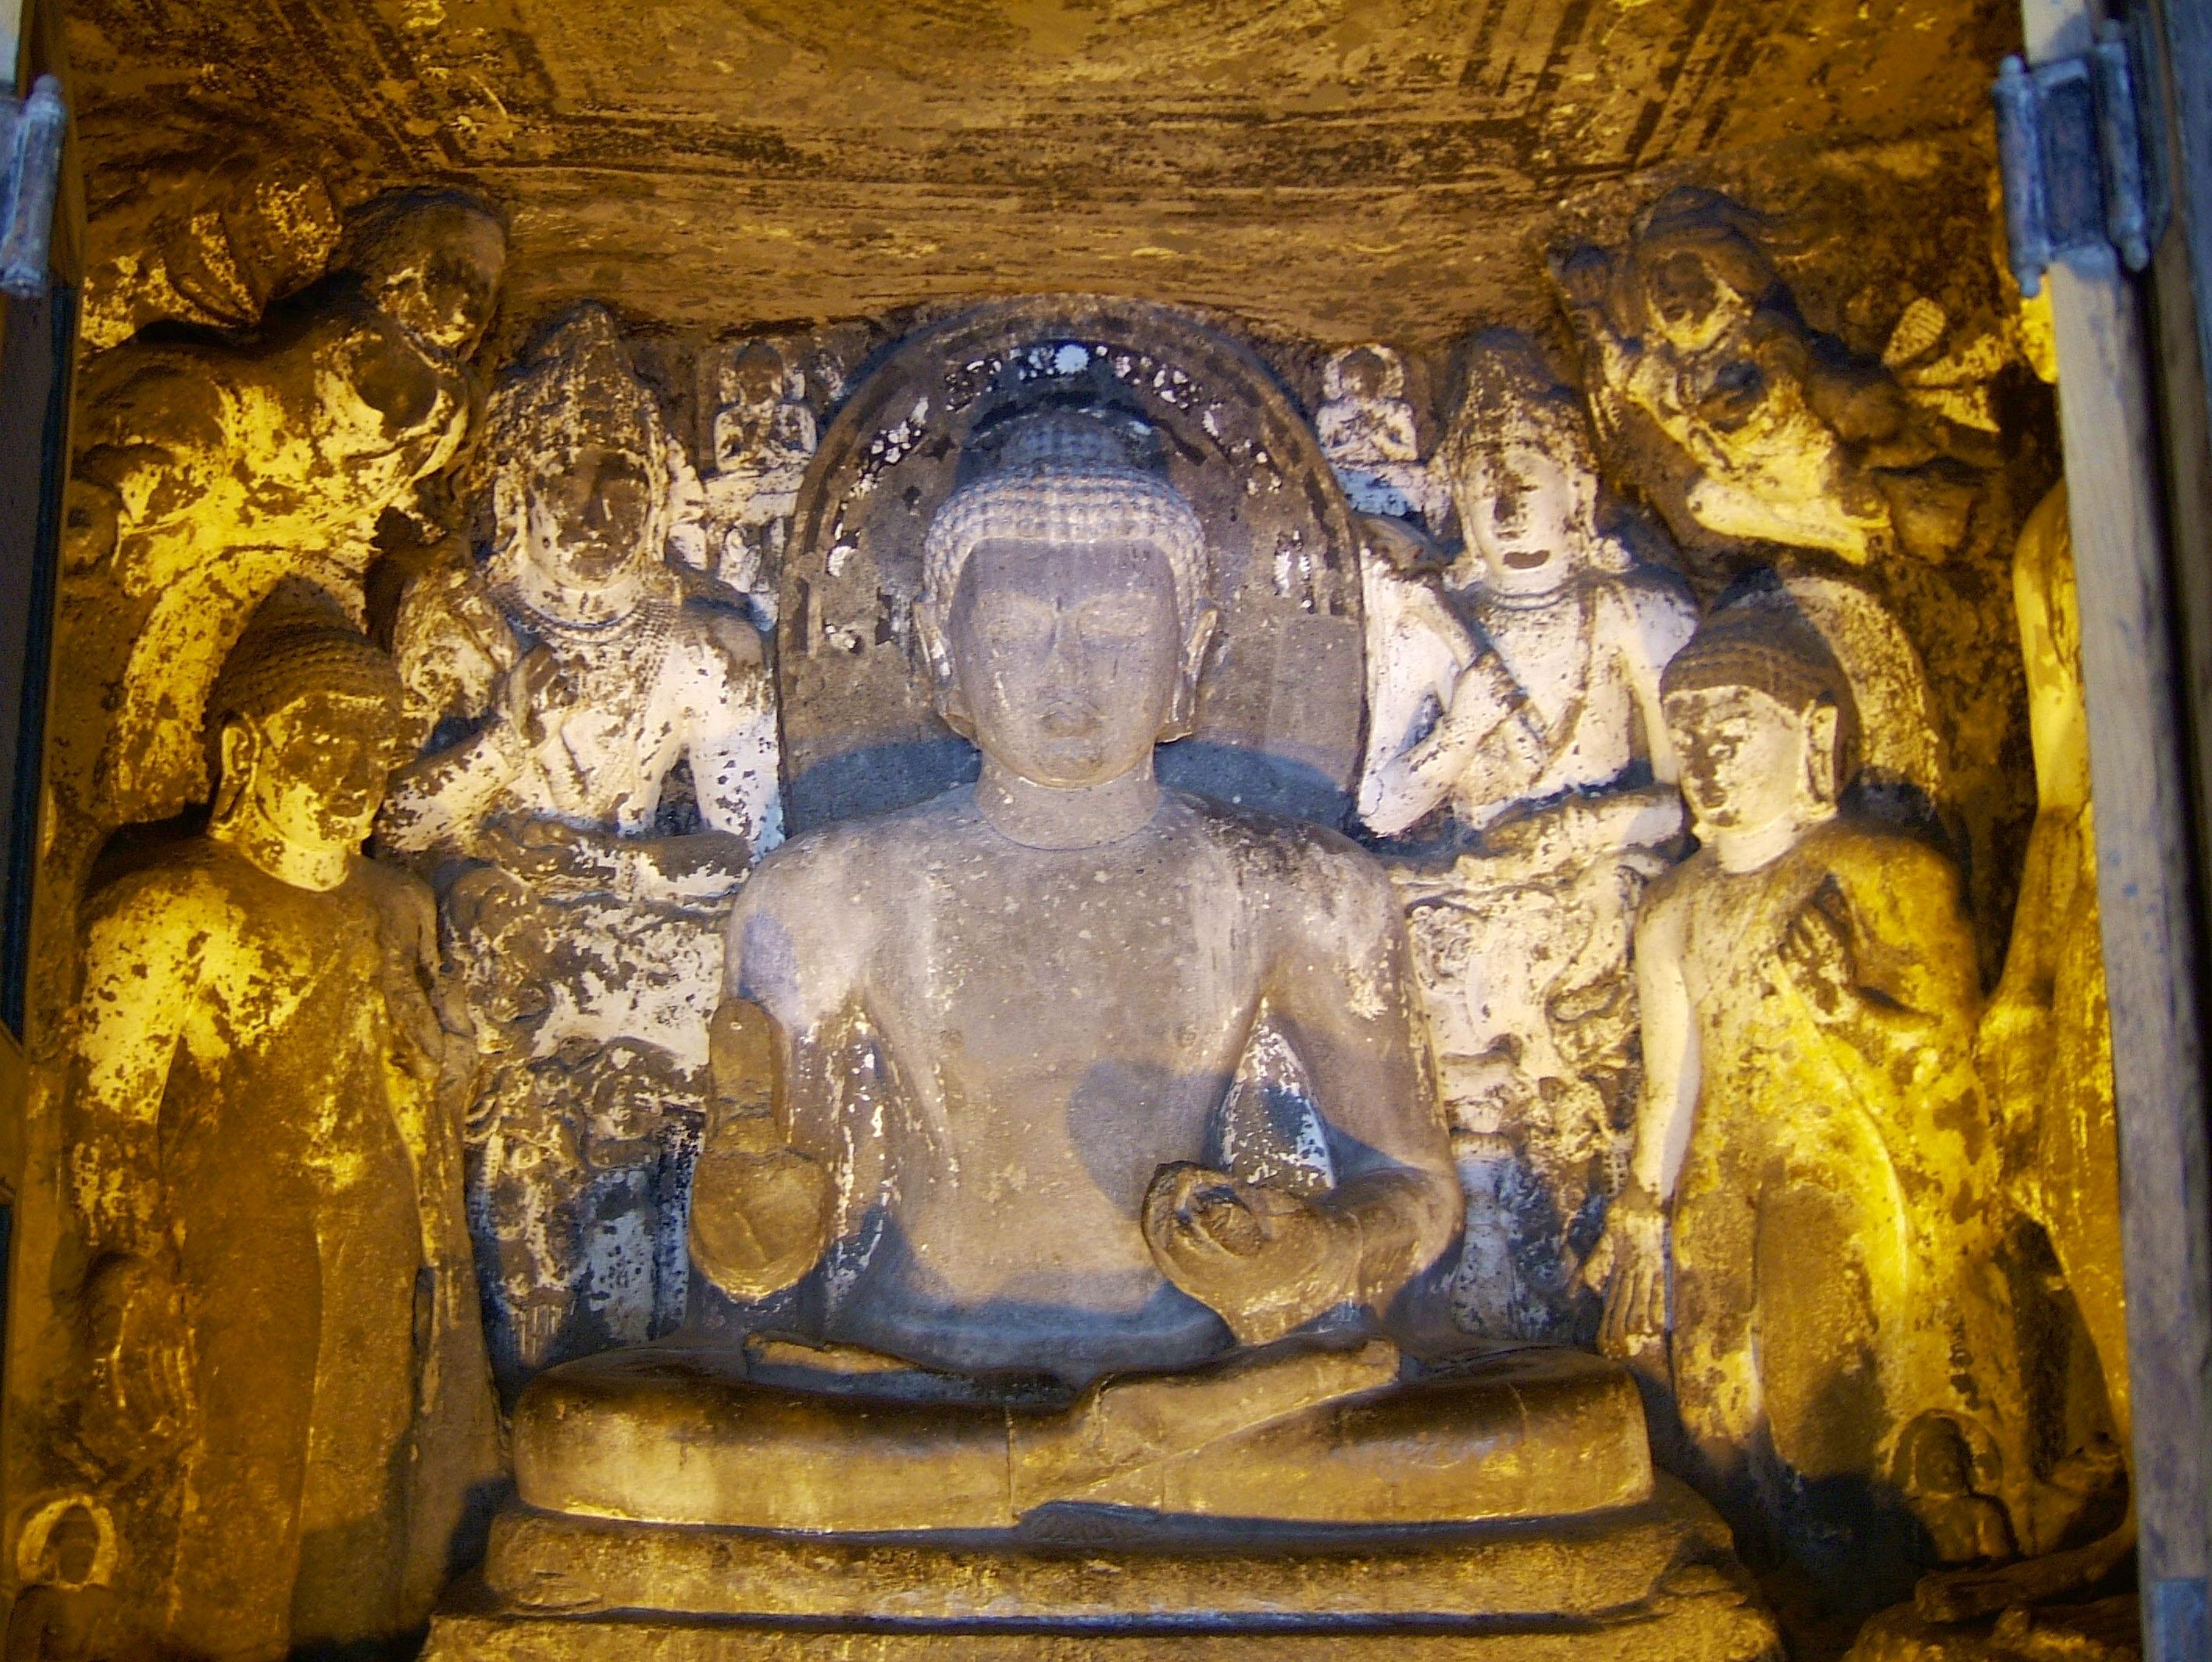 Marathwada Ajanta Caves Buddha carvings India Apr 2004 03